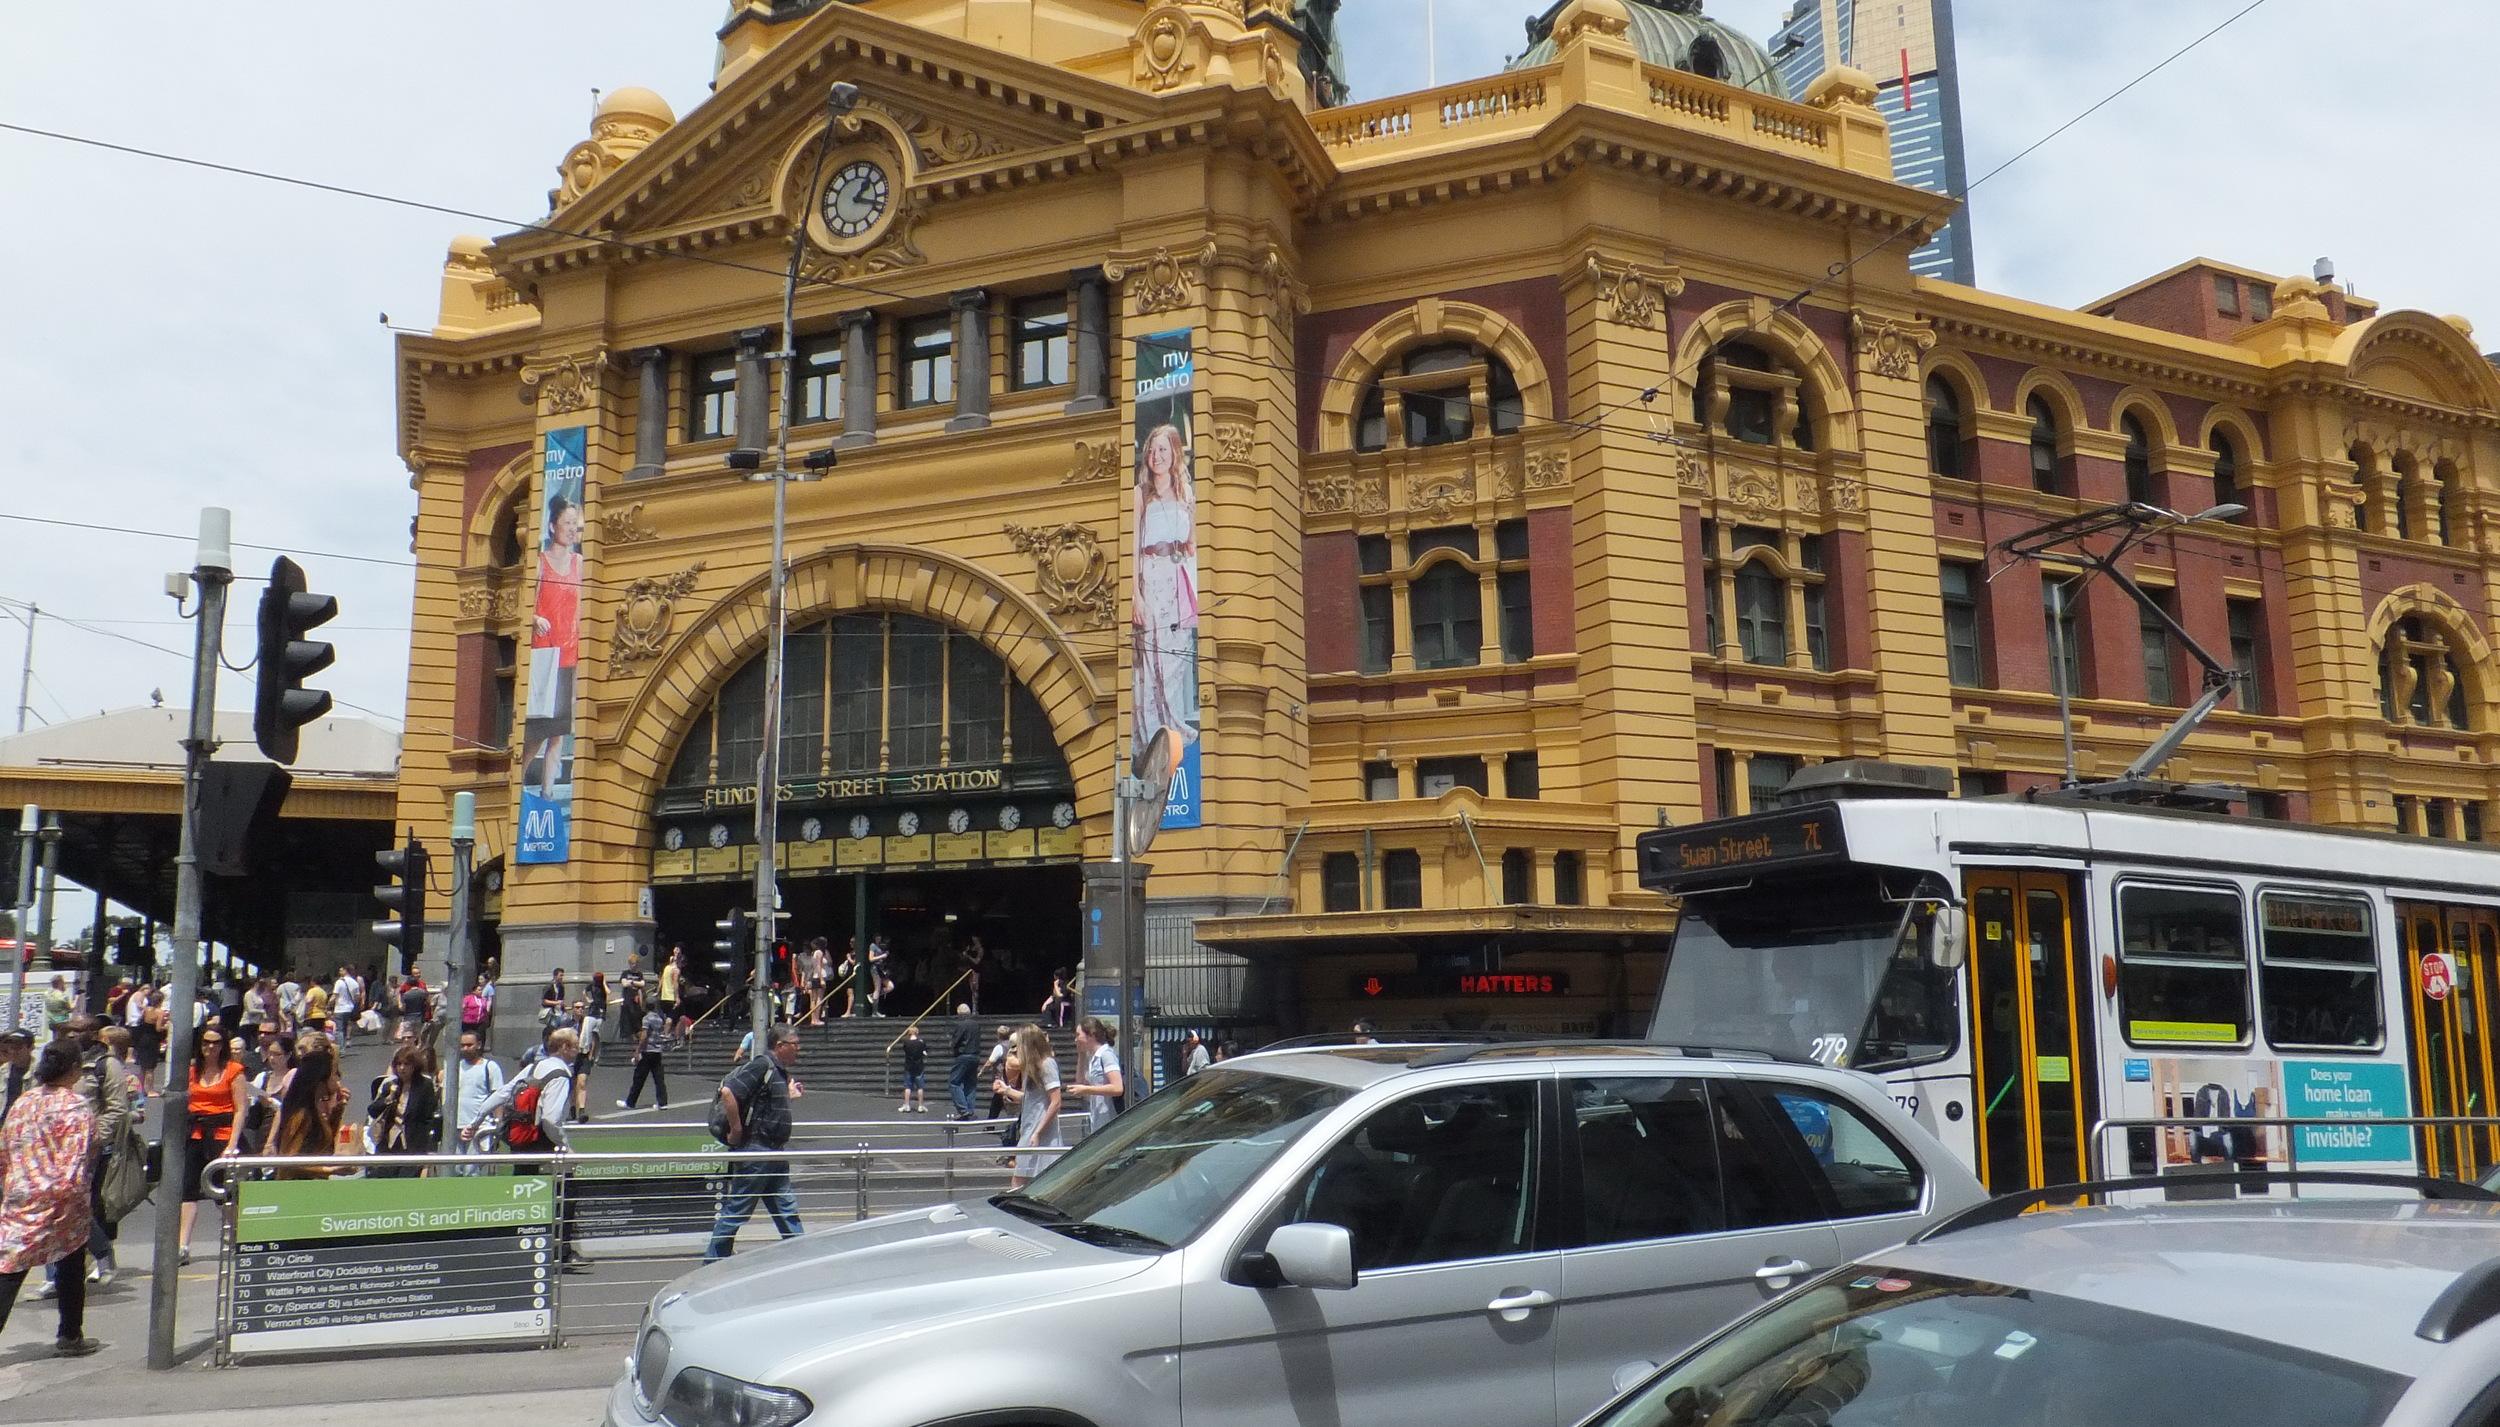 Melbourne DSCF3418 Victoria_iancochrane.jpg